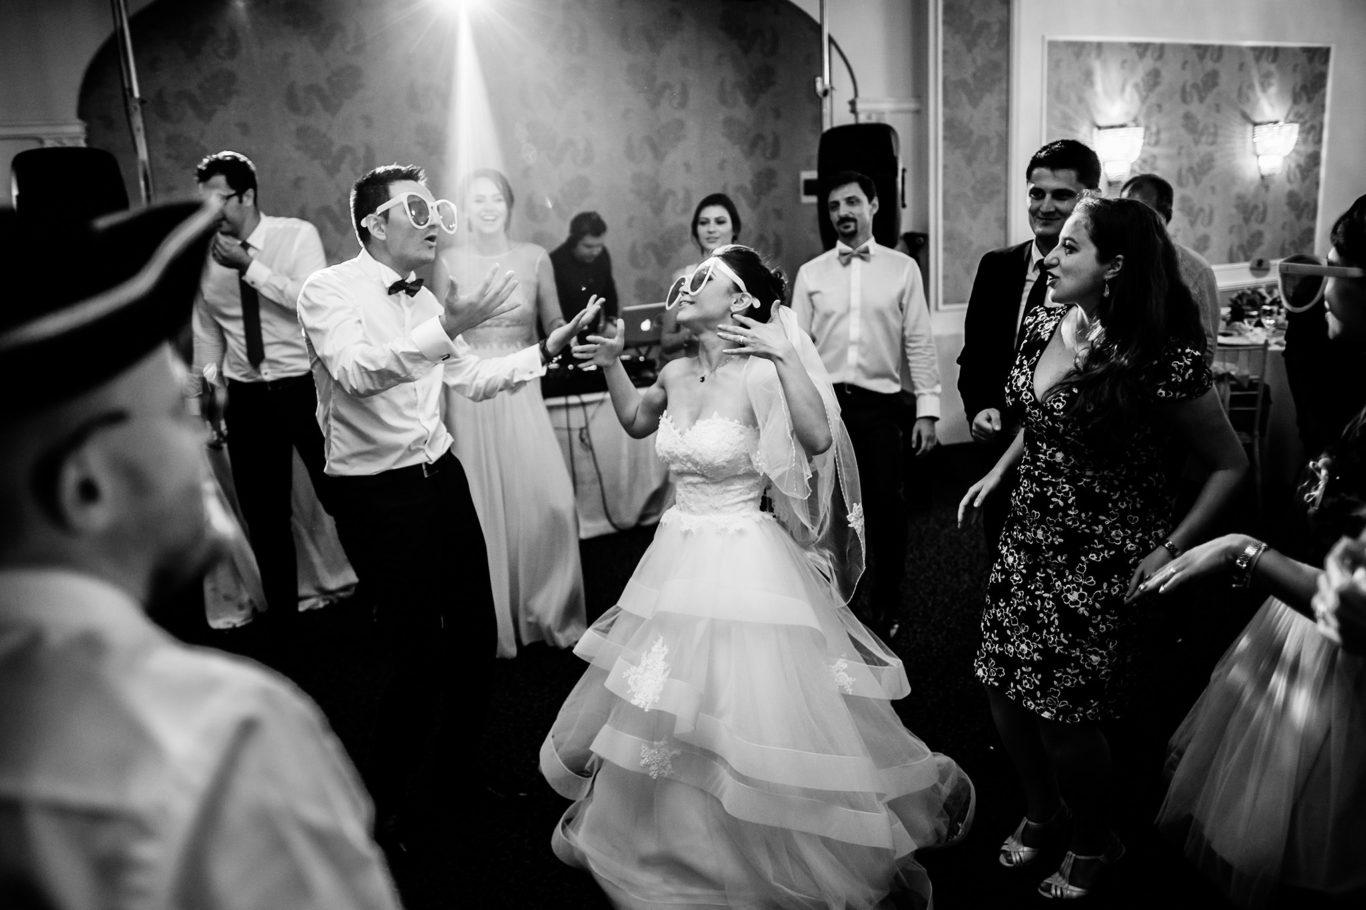 0651-fotografie-nunta-bucuresti-cristina-nicusor-fotograf-ciprian-dumitrescu-dc1_0392-2